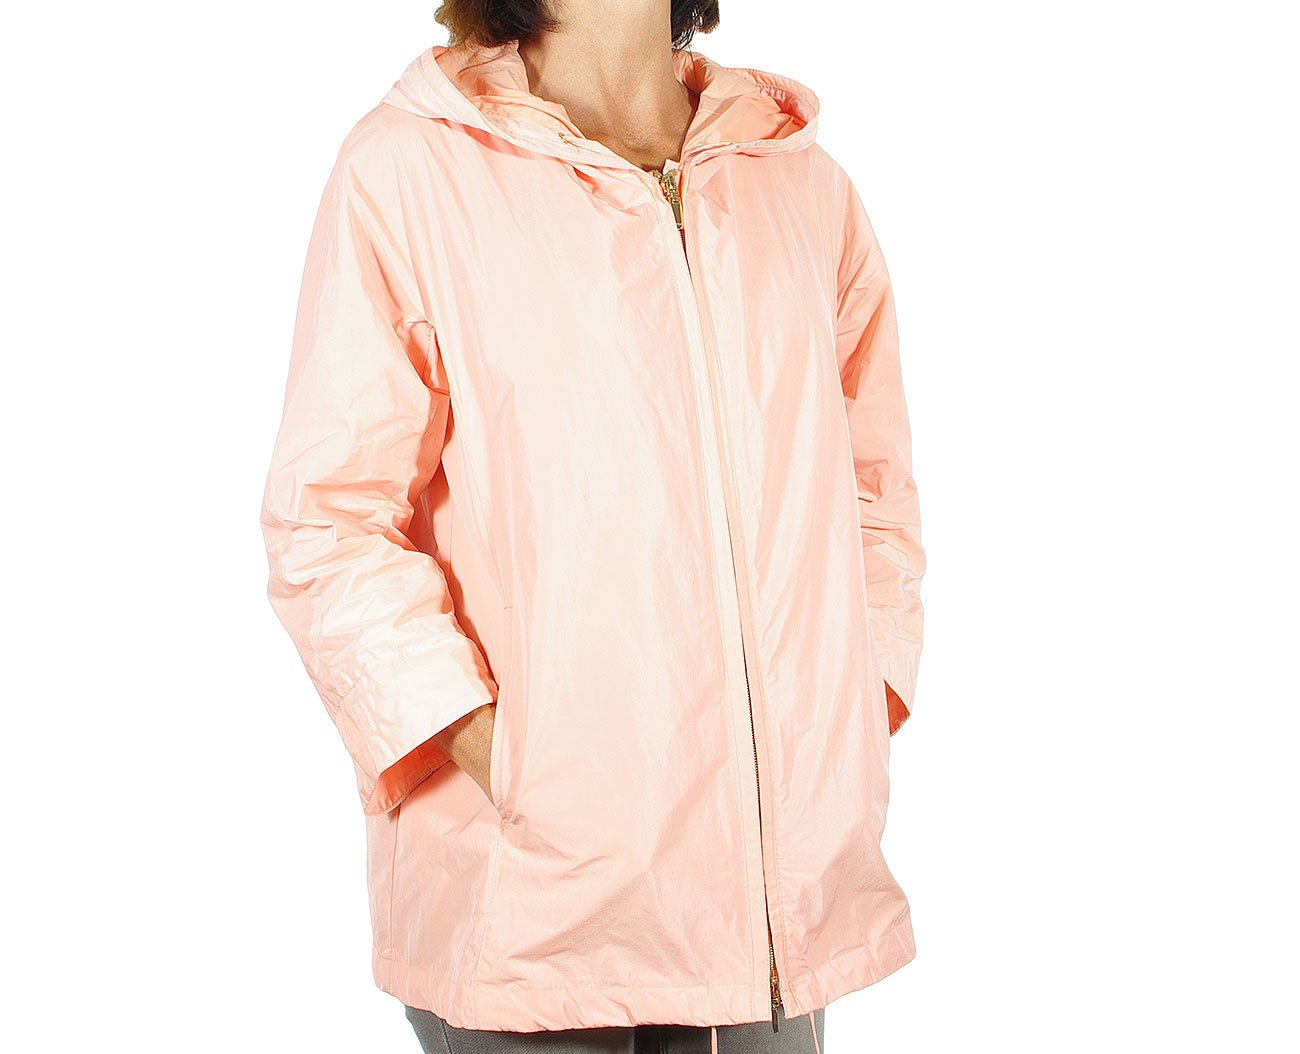 GEOX W8220Q kurtka woman jacket bright salmon